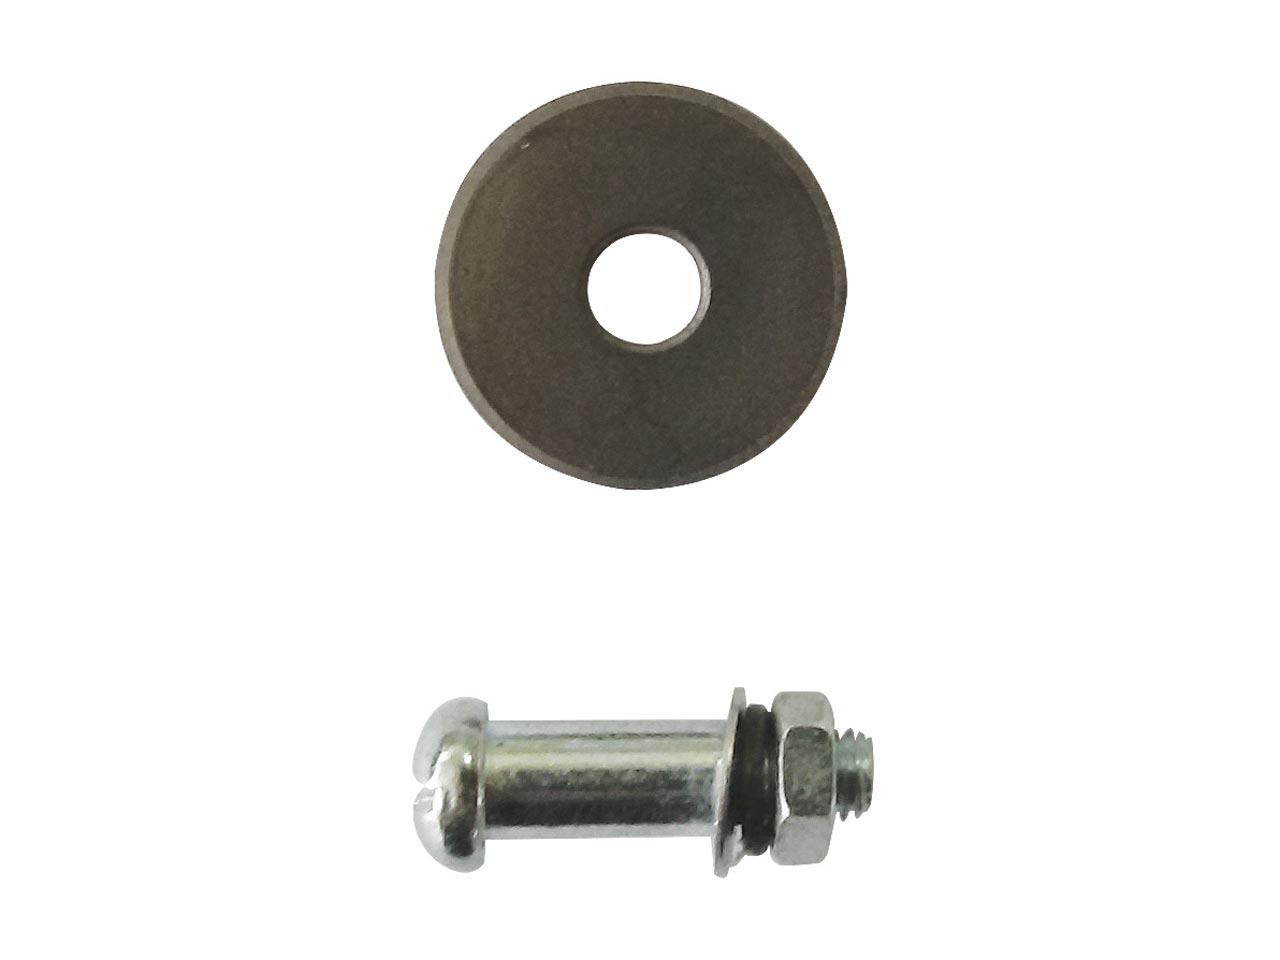 22 mm Silverline Tile Cutter Wheel Cutter-Roue de Remplacement 633006 290193